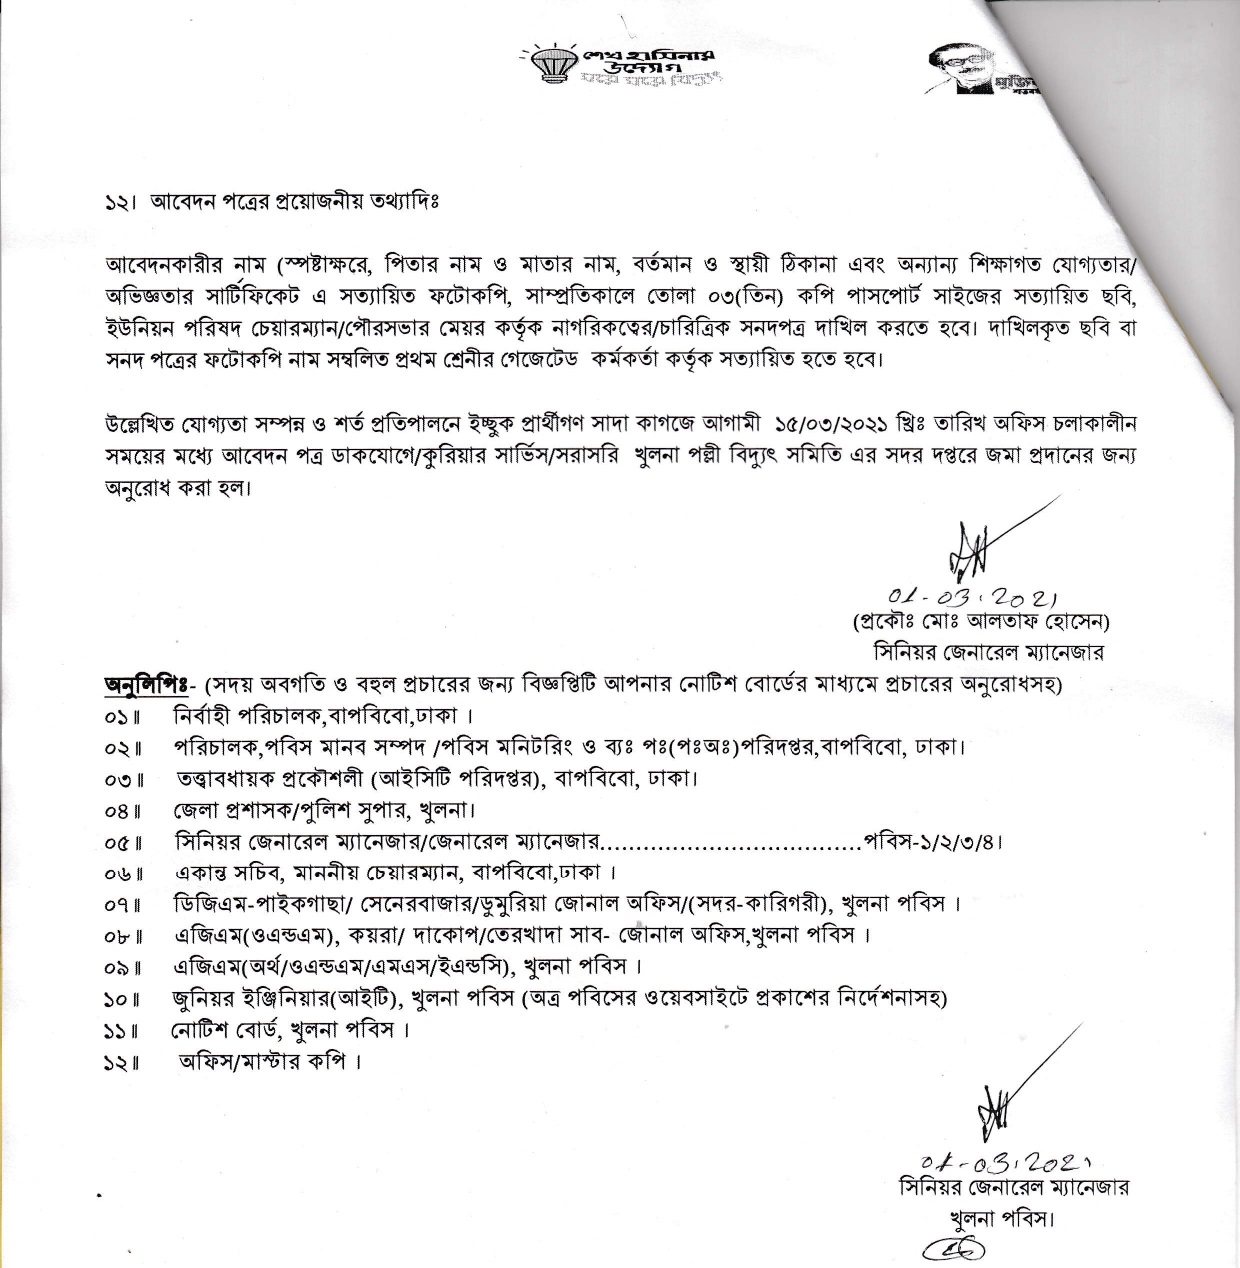 khulna palli bidyut somiti job circular 2021 - খুলনা পল্লী বিদ্যুৎ সমিতি  চাকরির খবর ২০২১